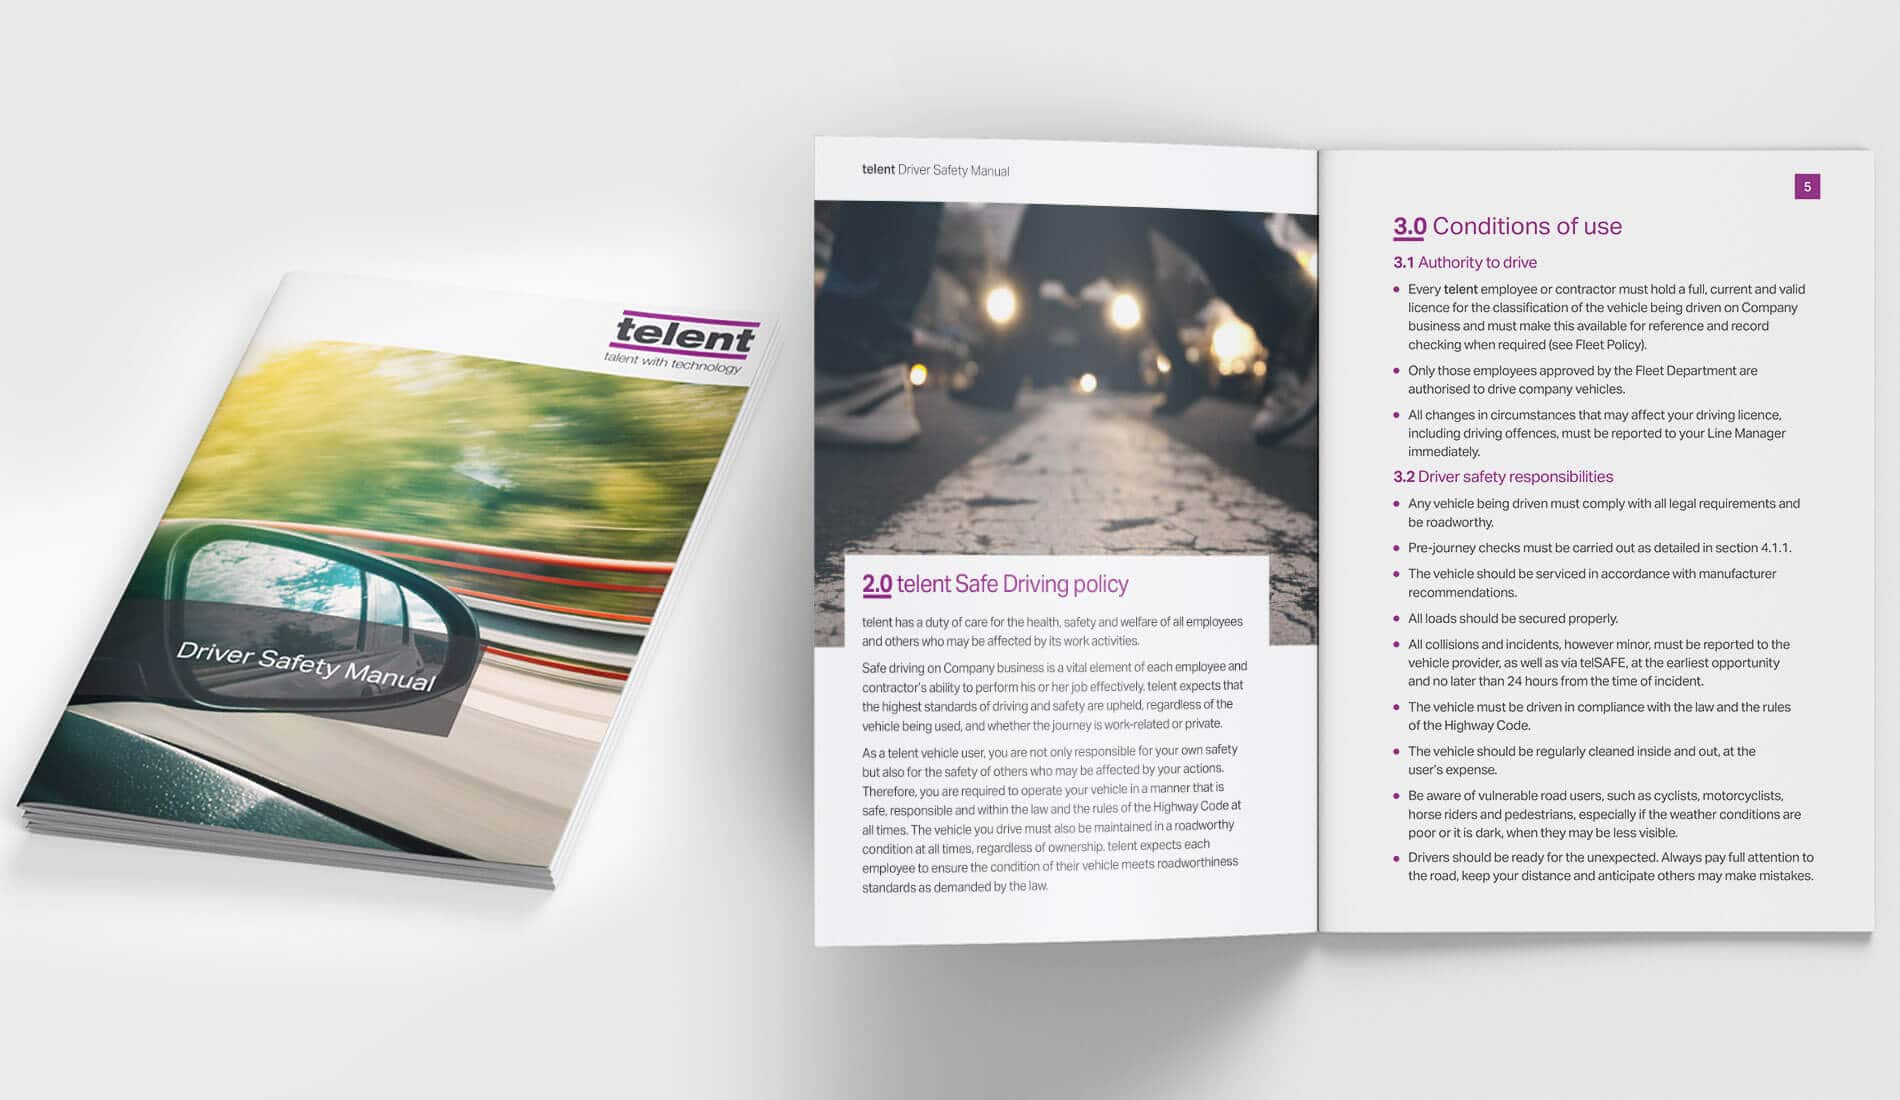 Telent Driver Safety Manual design